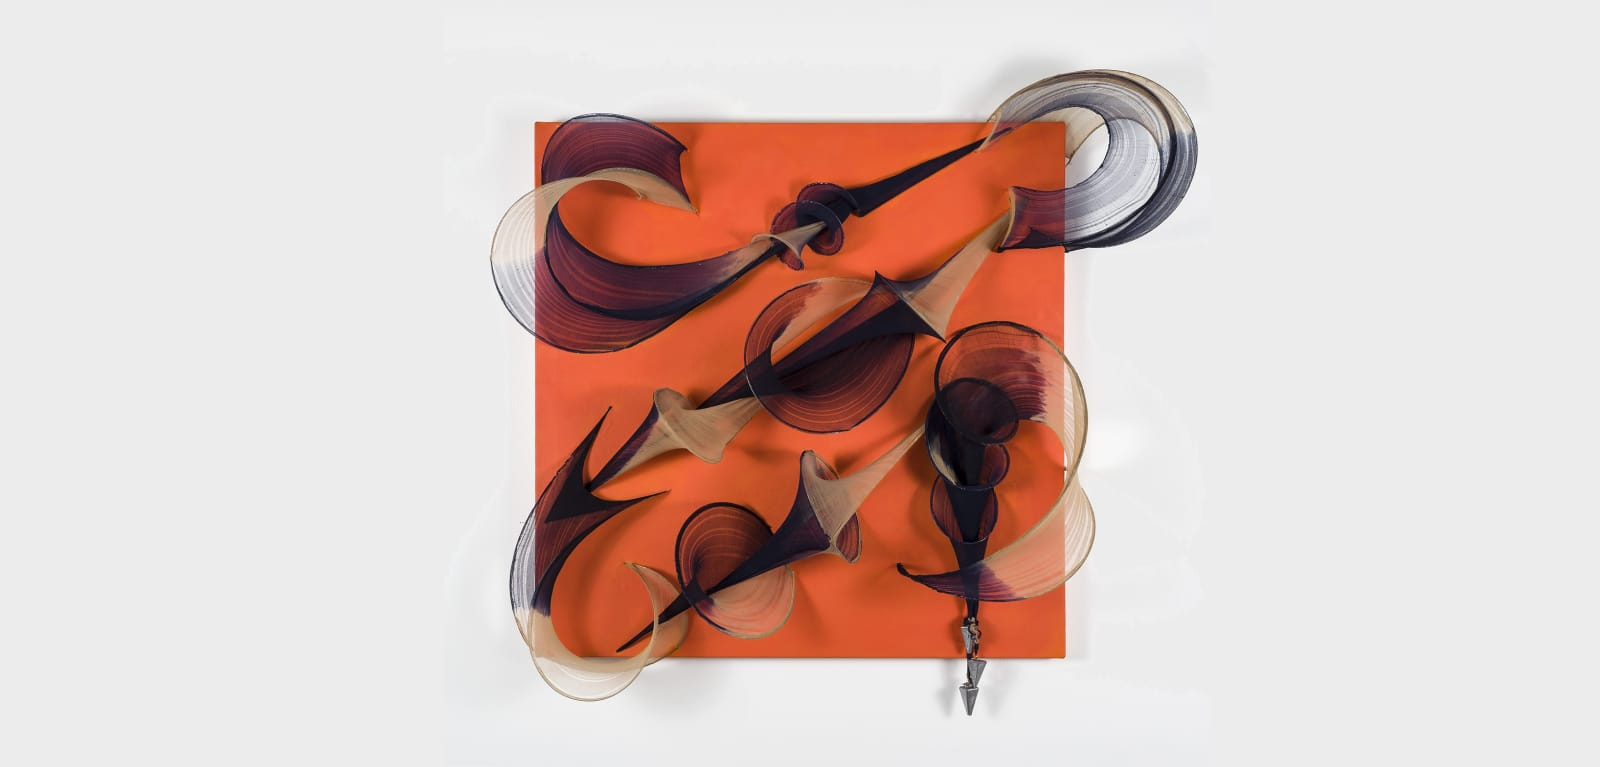 "Ouroboros, 2018, Penelope Ross, Mixed media, 36 x 36 x 12"""